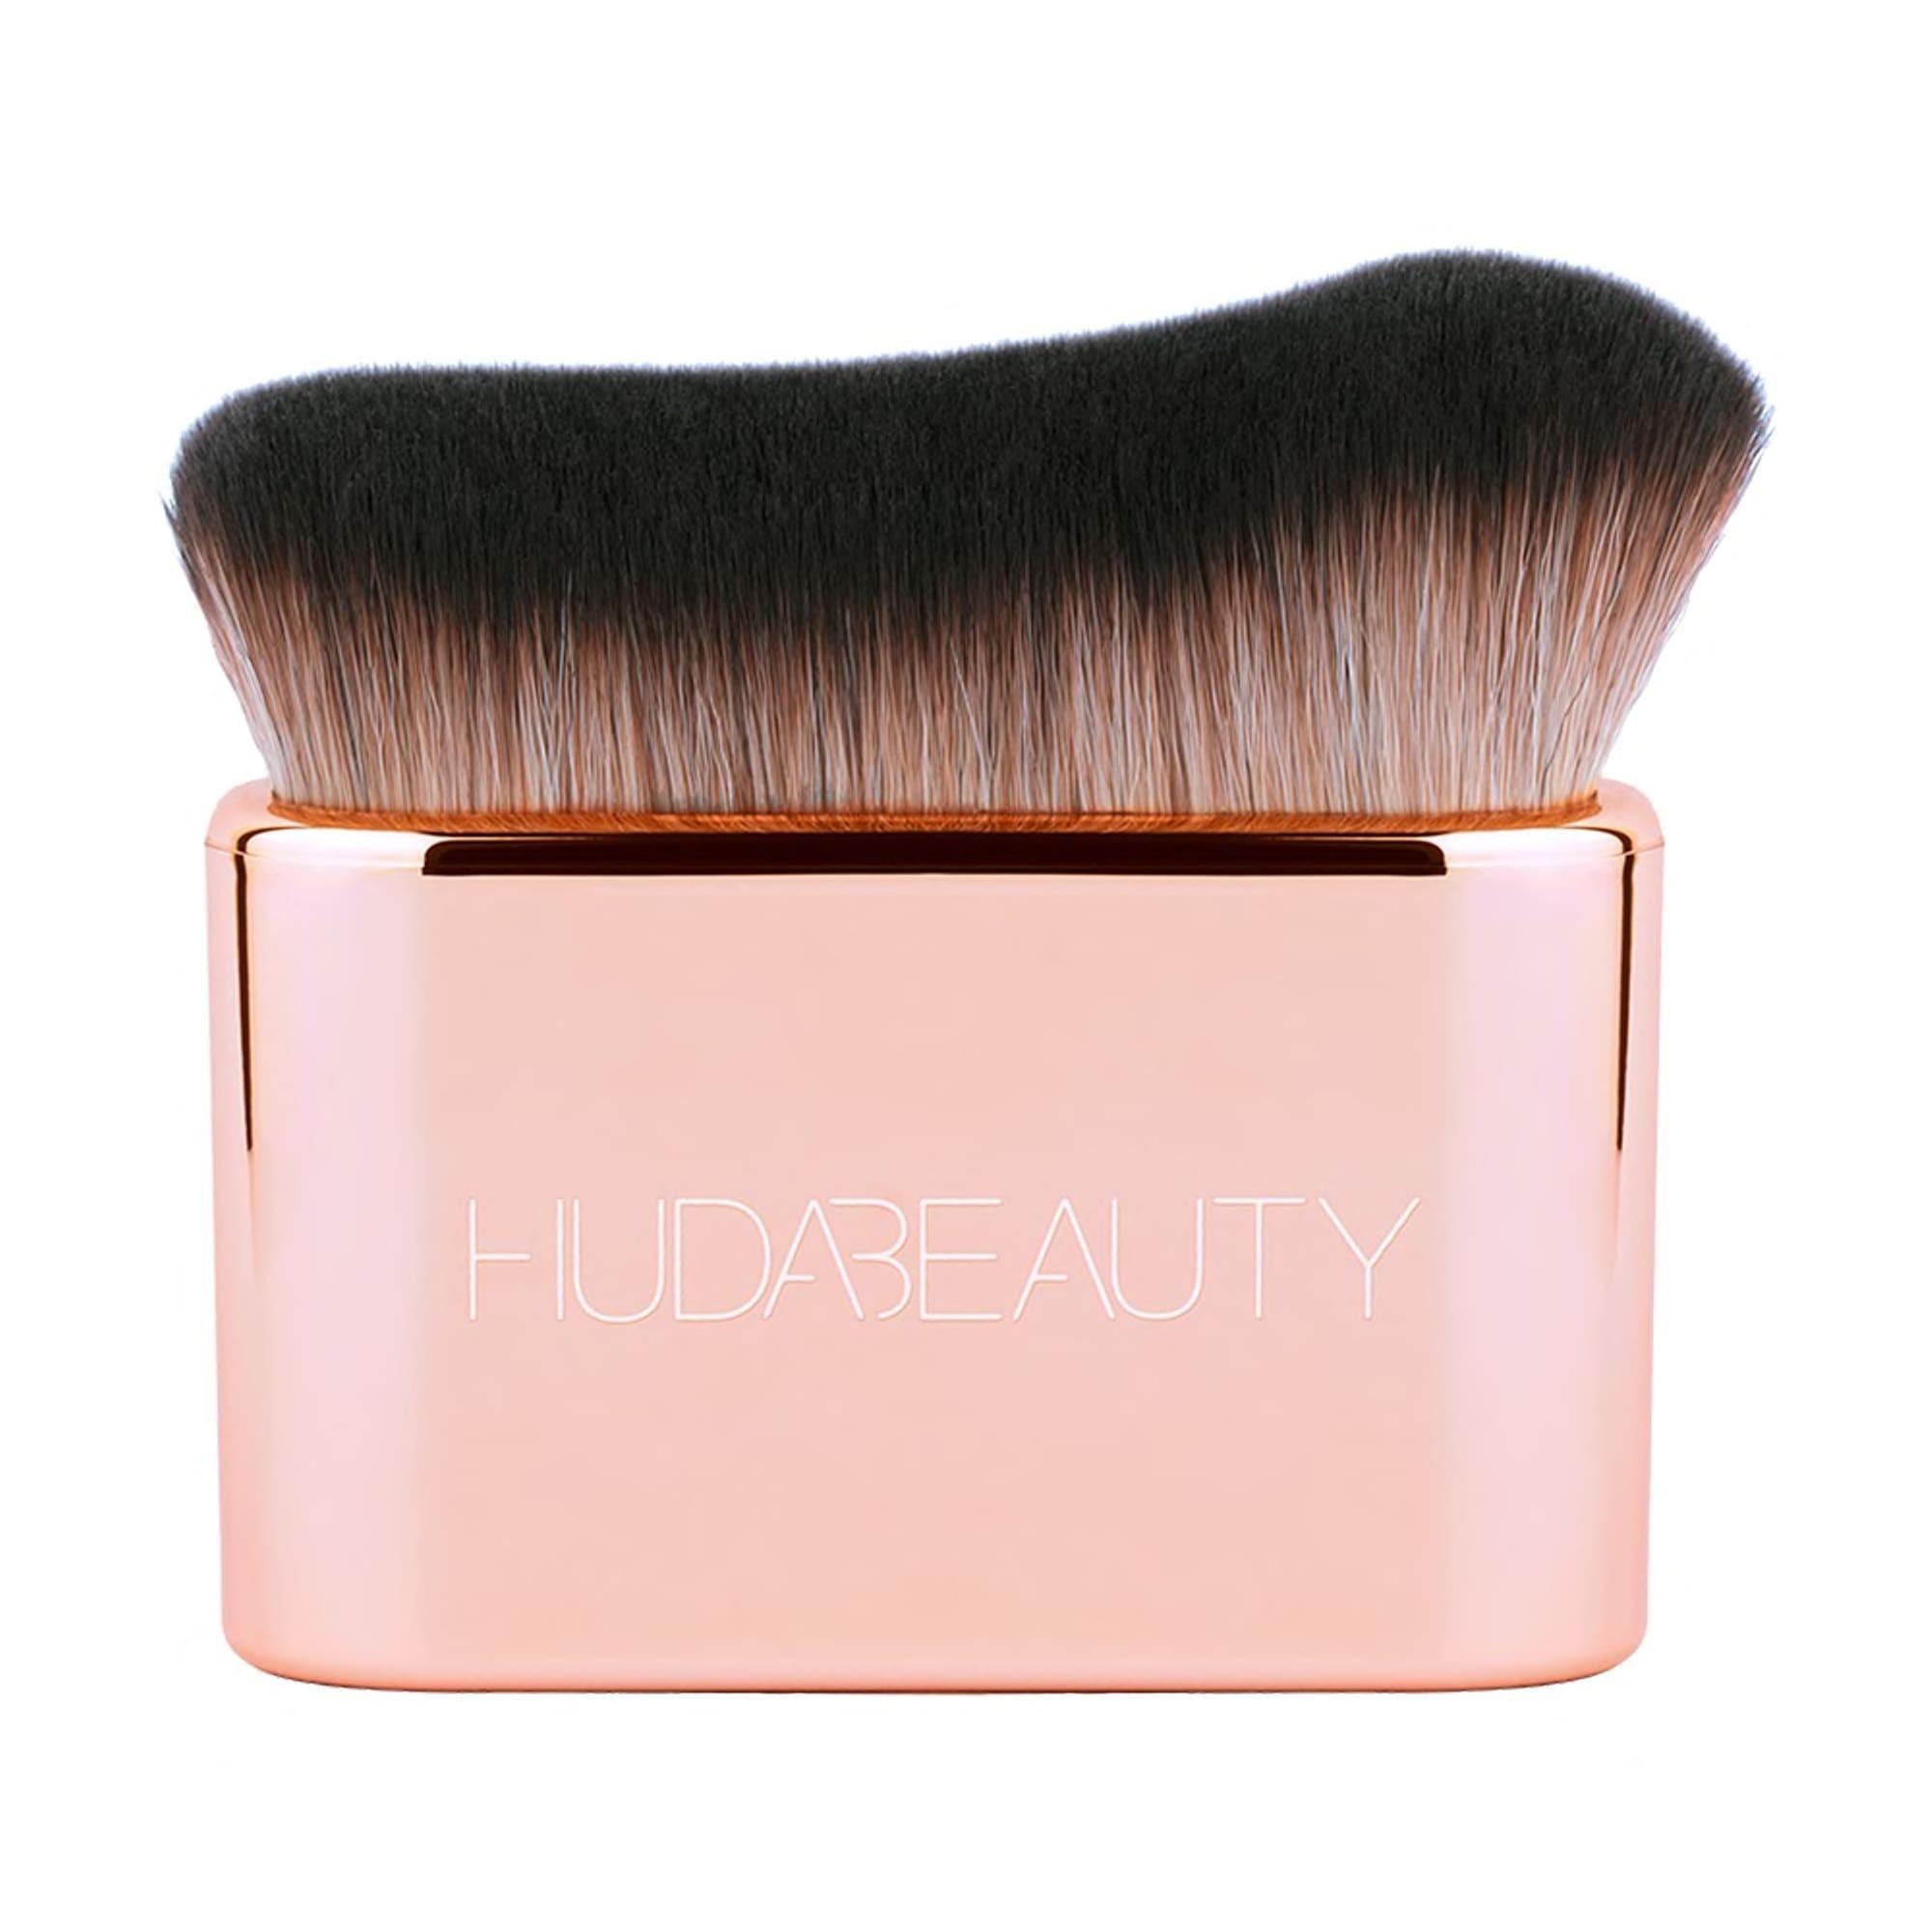 Huda Beauty N.Y.M.P.H Body Blur & Glow Brush